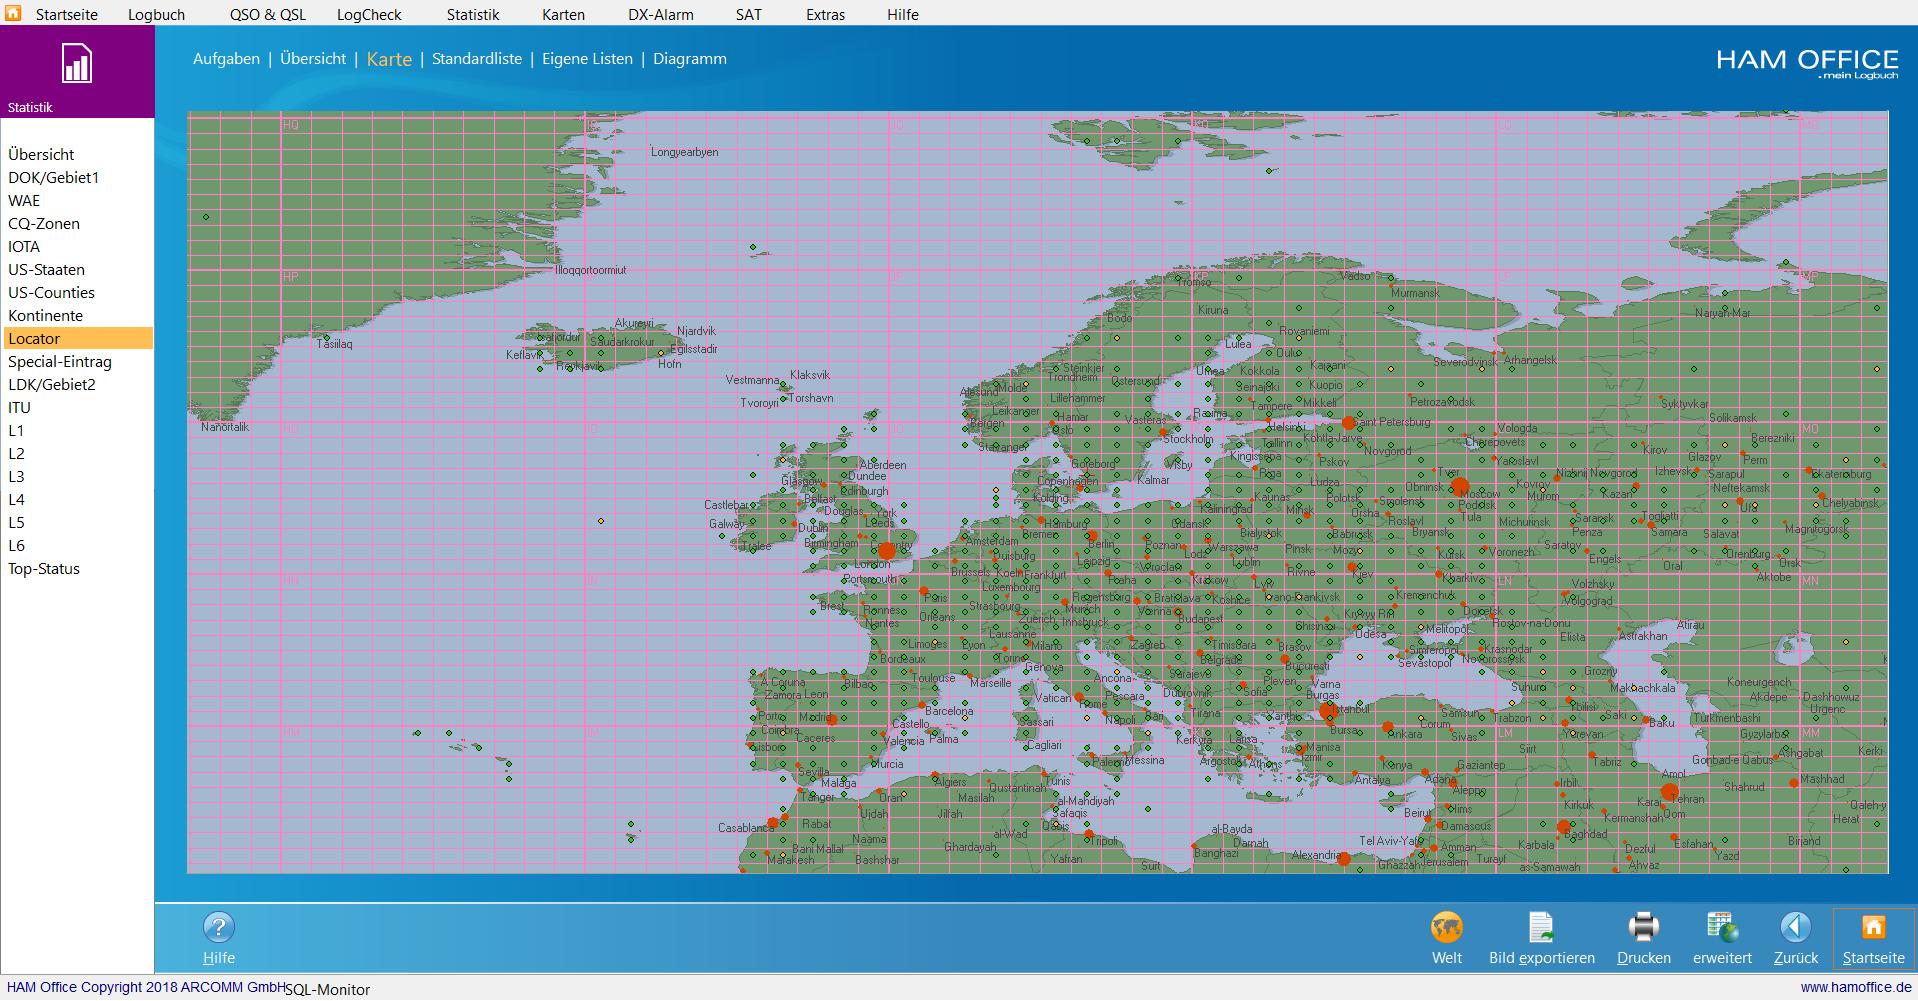 qso-auswertungen locator-karte EU hamoffice mein amateurfunk logbuch